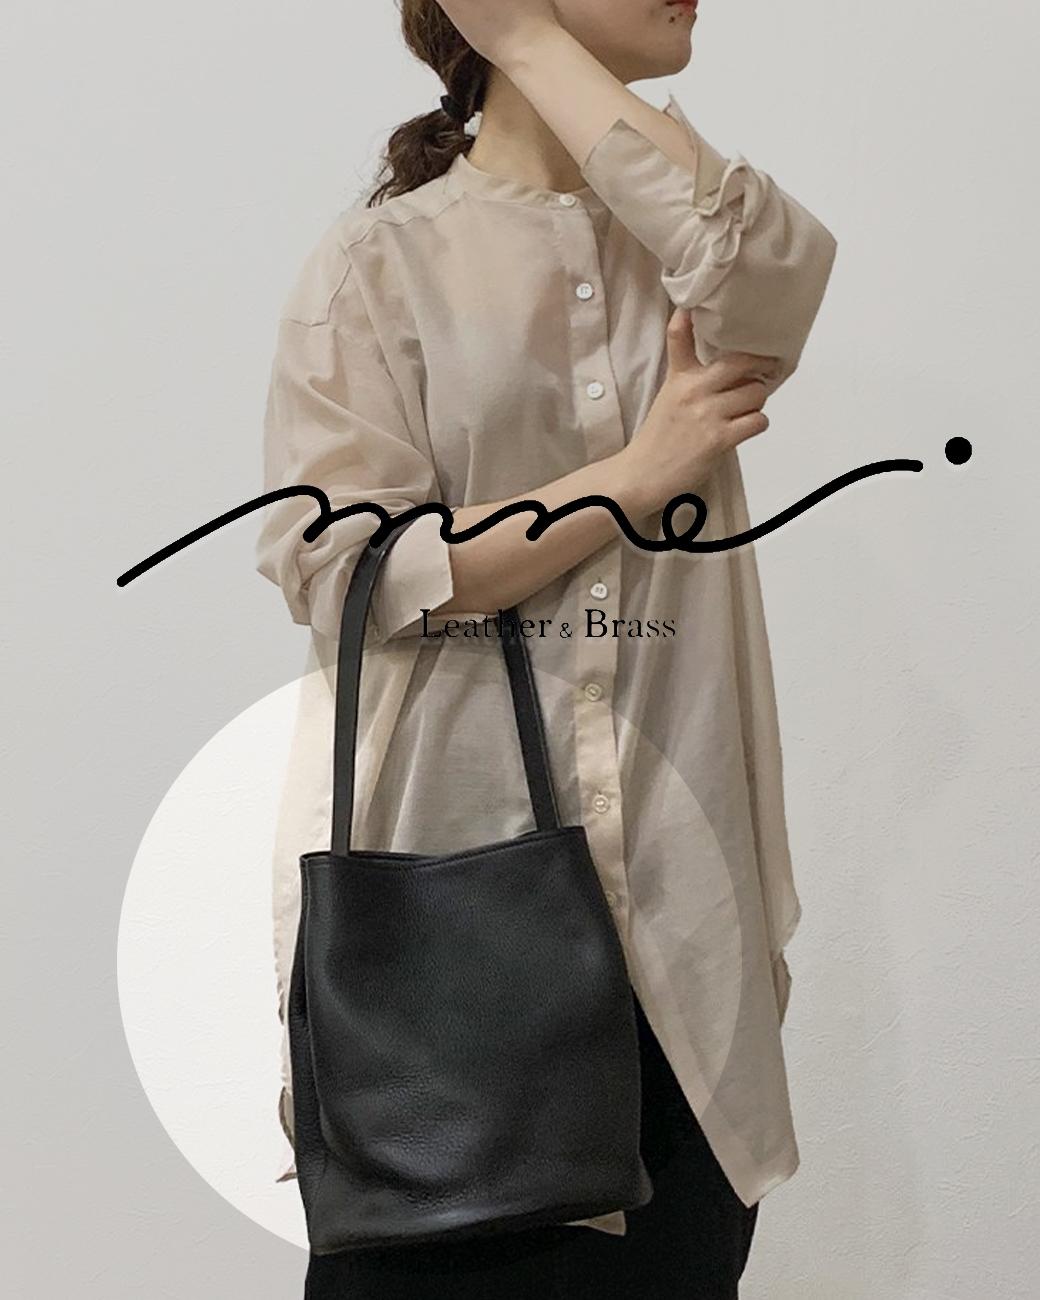 mnoi C bag